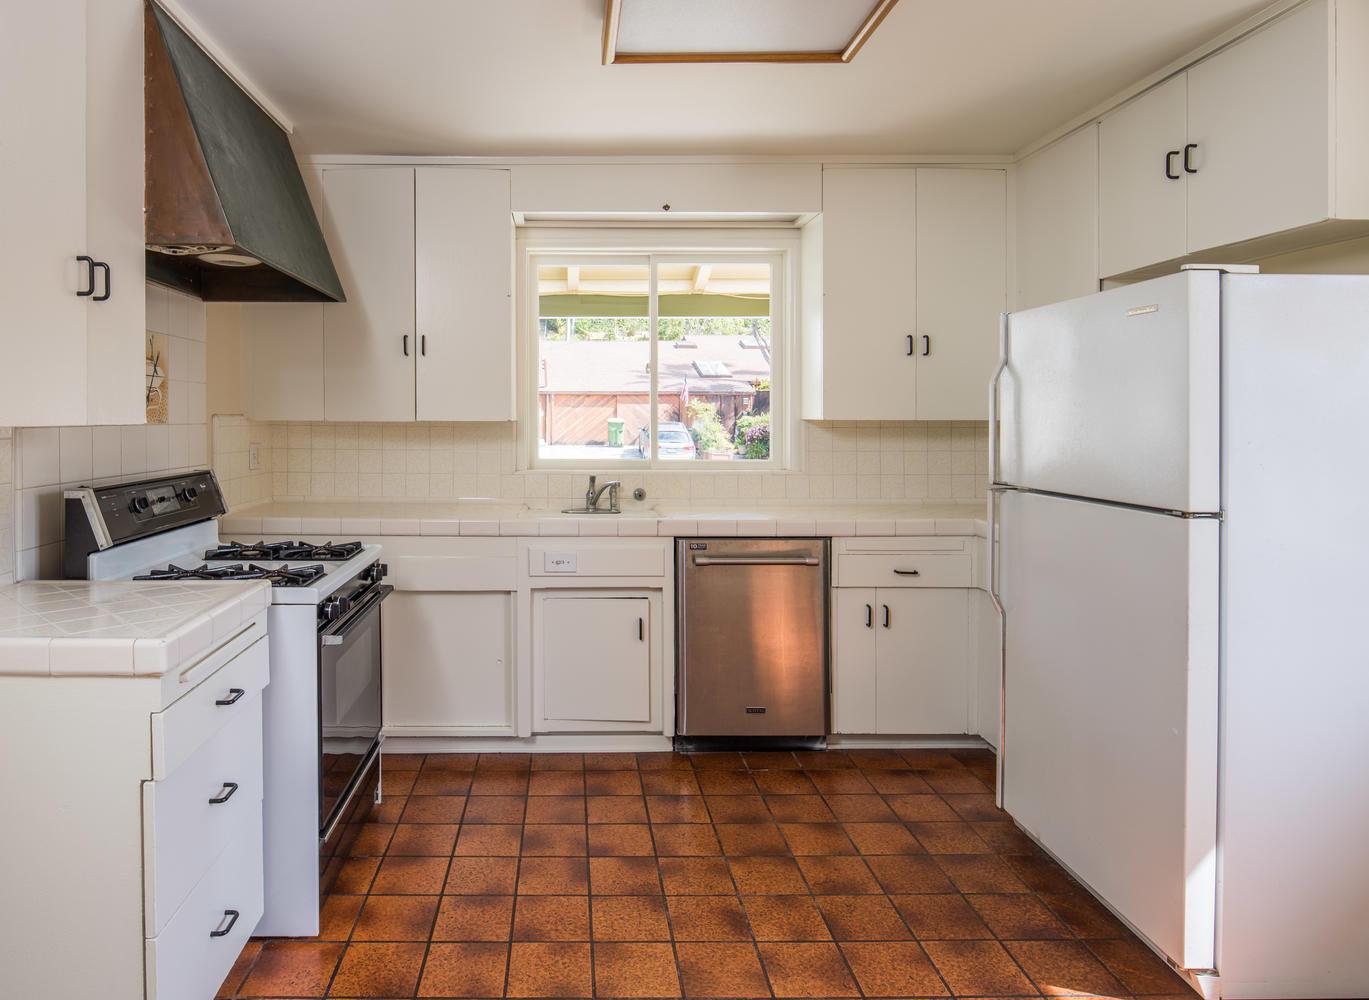 833 Bienveneda Ave Pacific-large-006-1-Kitchen-1370x1000-72dpi.jpg